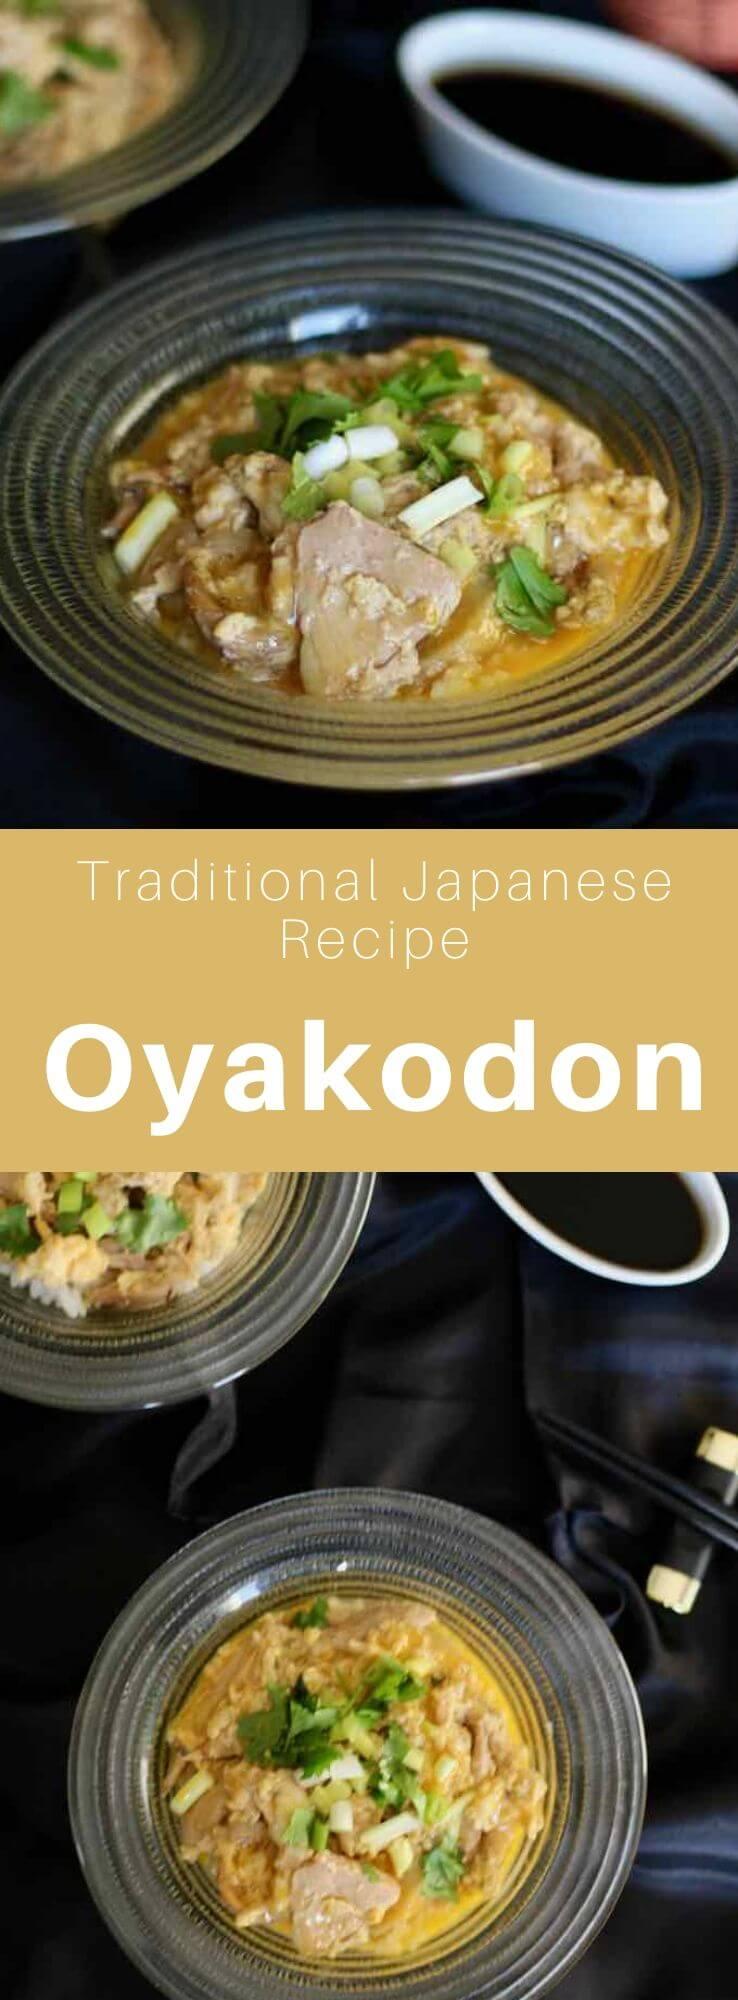 Oyakodon (親子丼) is a donburi, made of chicken and egg, seasoned with dashi, mirin, sake, and soy sauce, very popular in Japan. #Japan #Japanese #JapaneseFood #JapaneseCuisine #JapaneseRecipe #AsianCuisine #AsianFood #AsianCuisine #WorldCuisine #196flavors